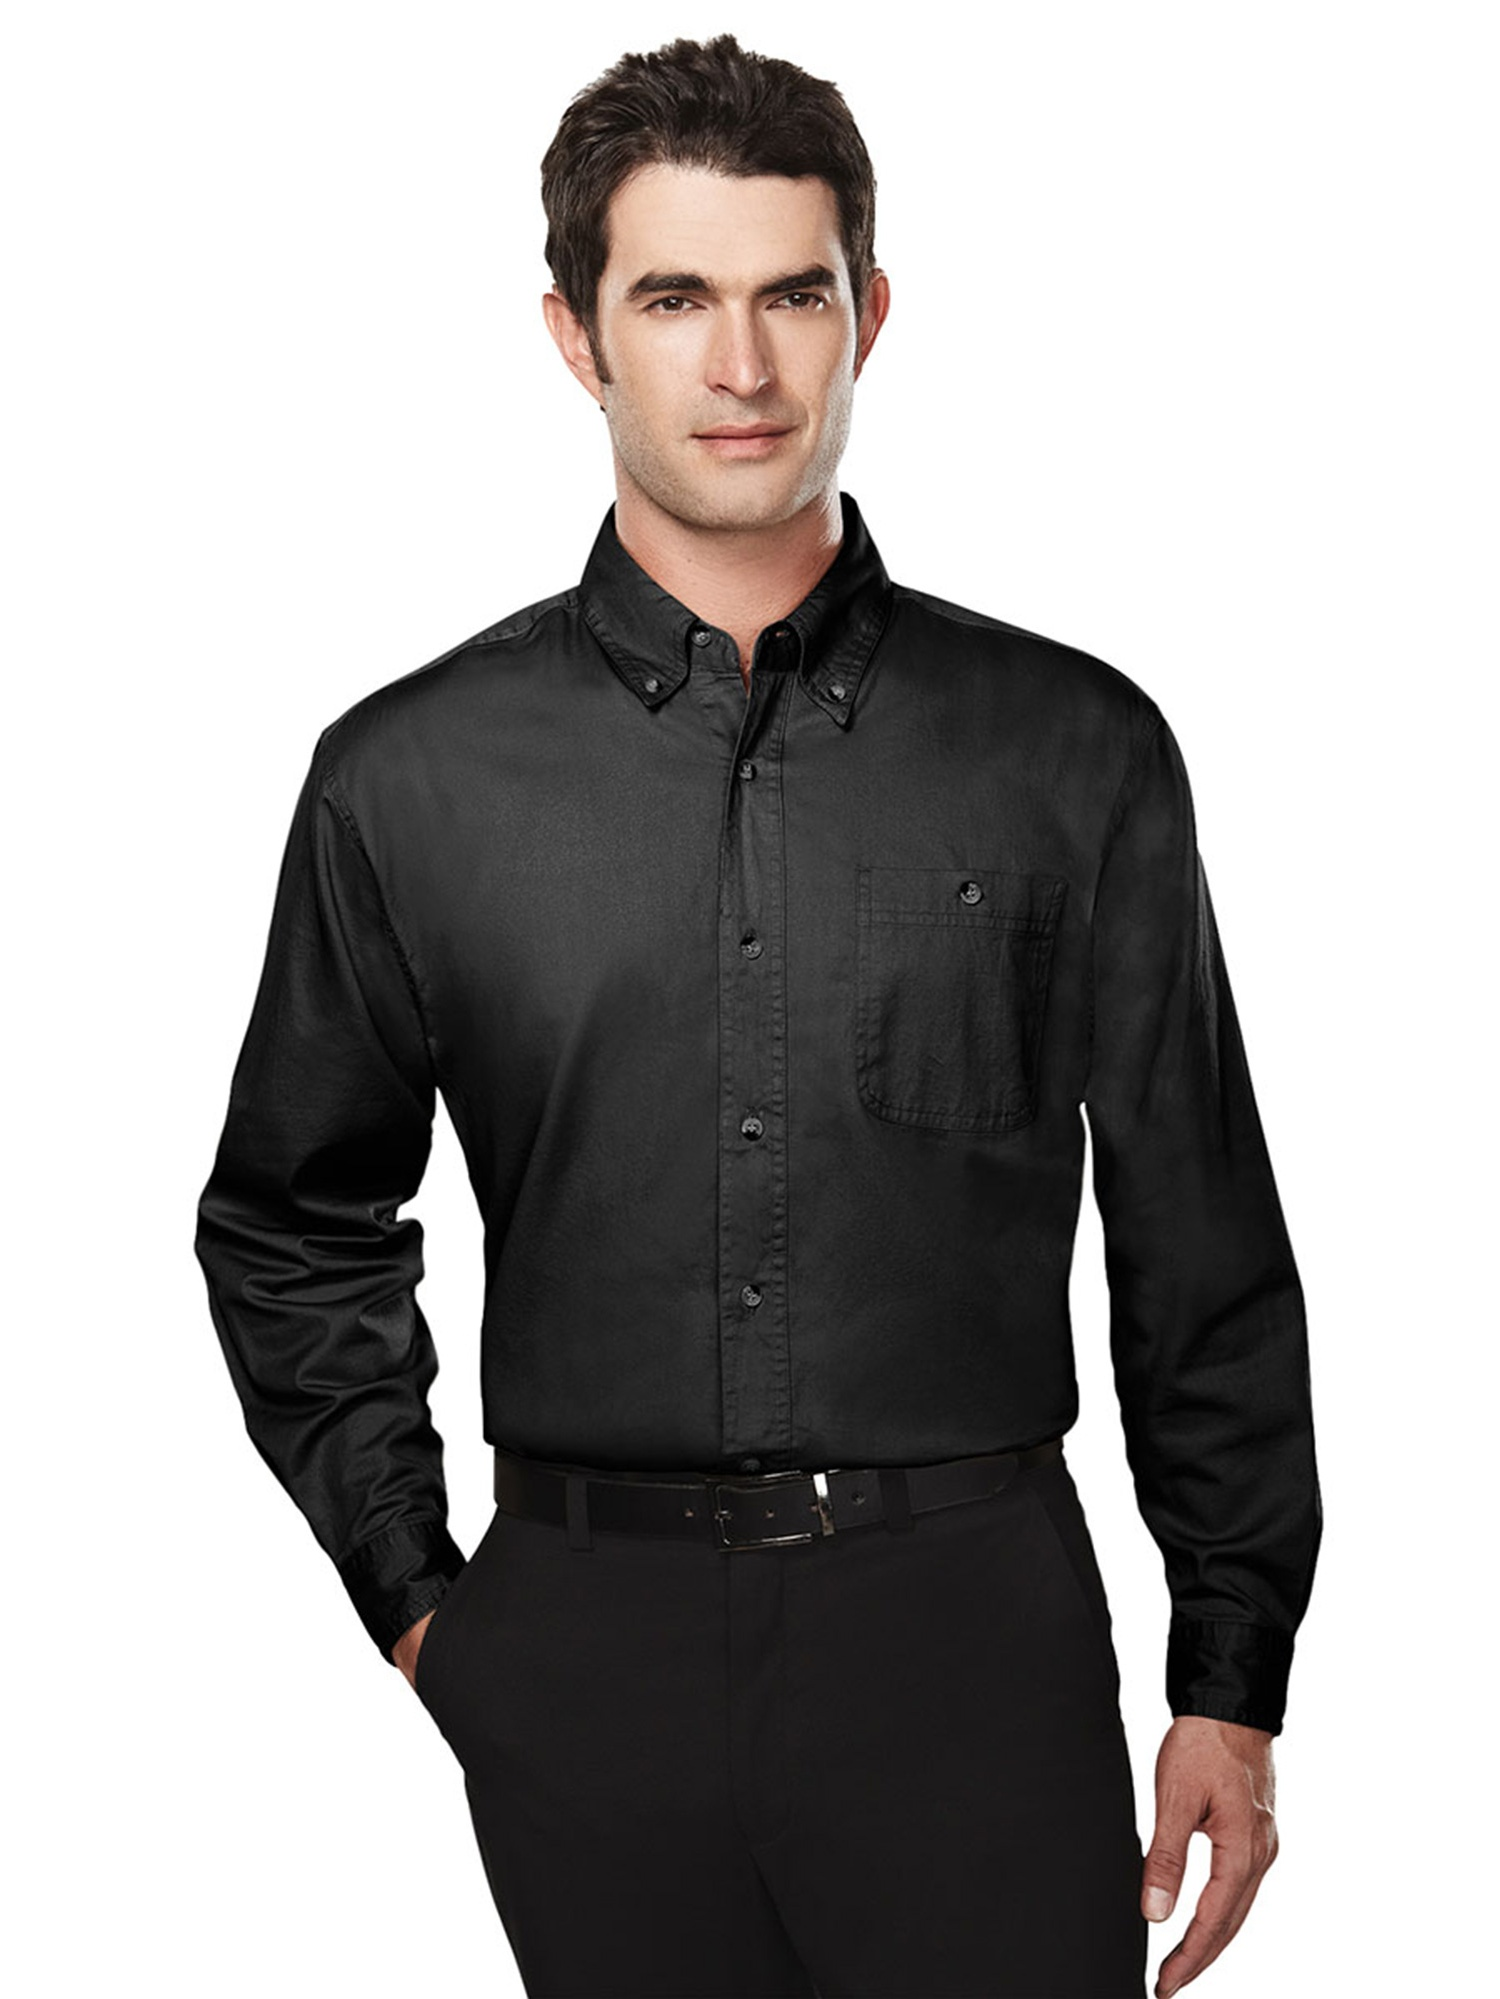 Tri-Mountain Men's Big And Tall Button Pocket Dress Shirt